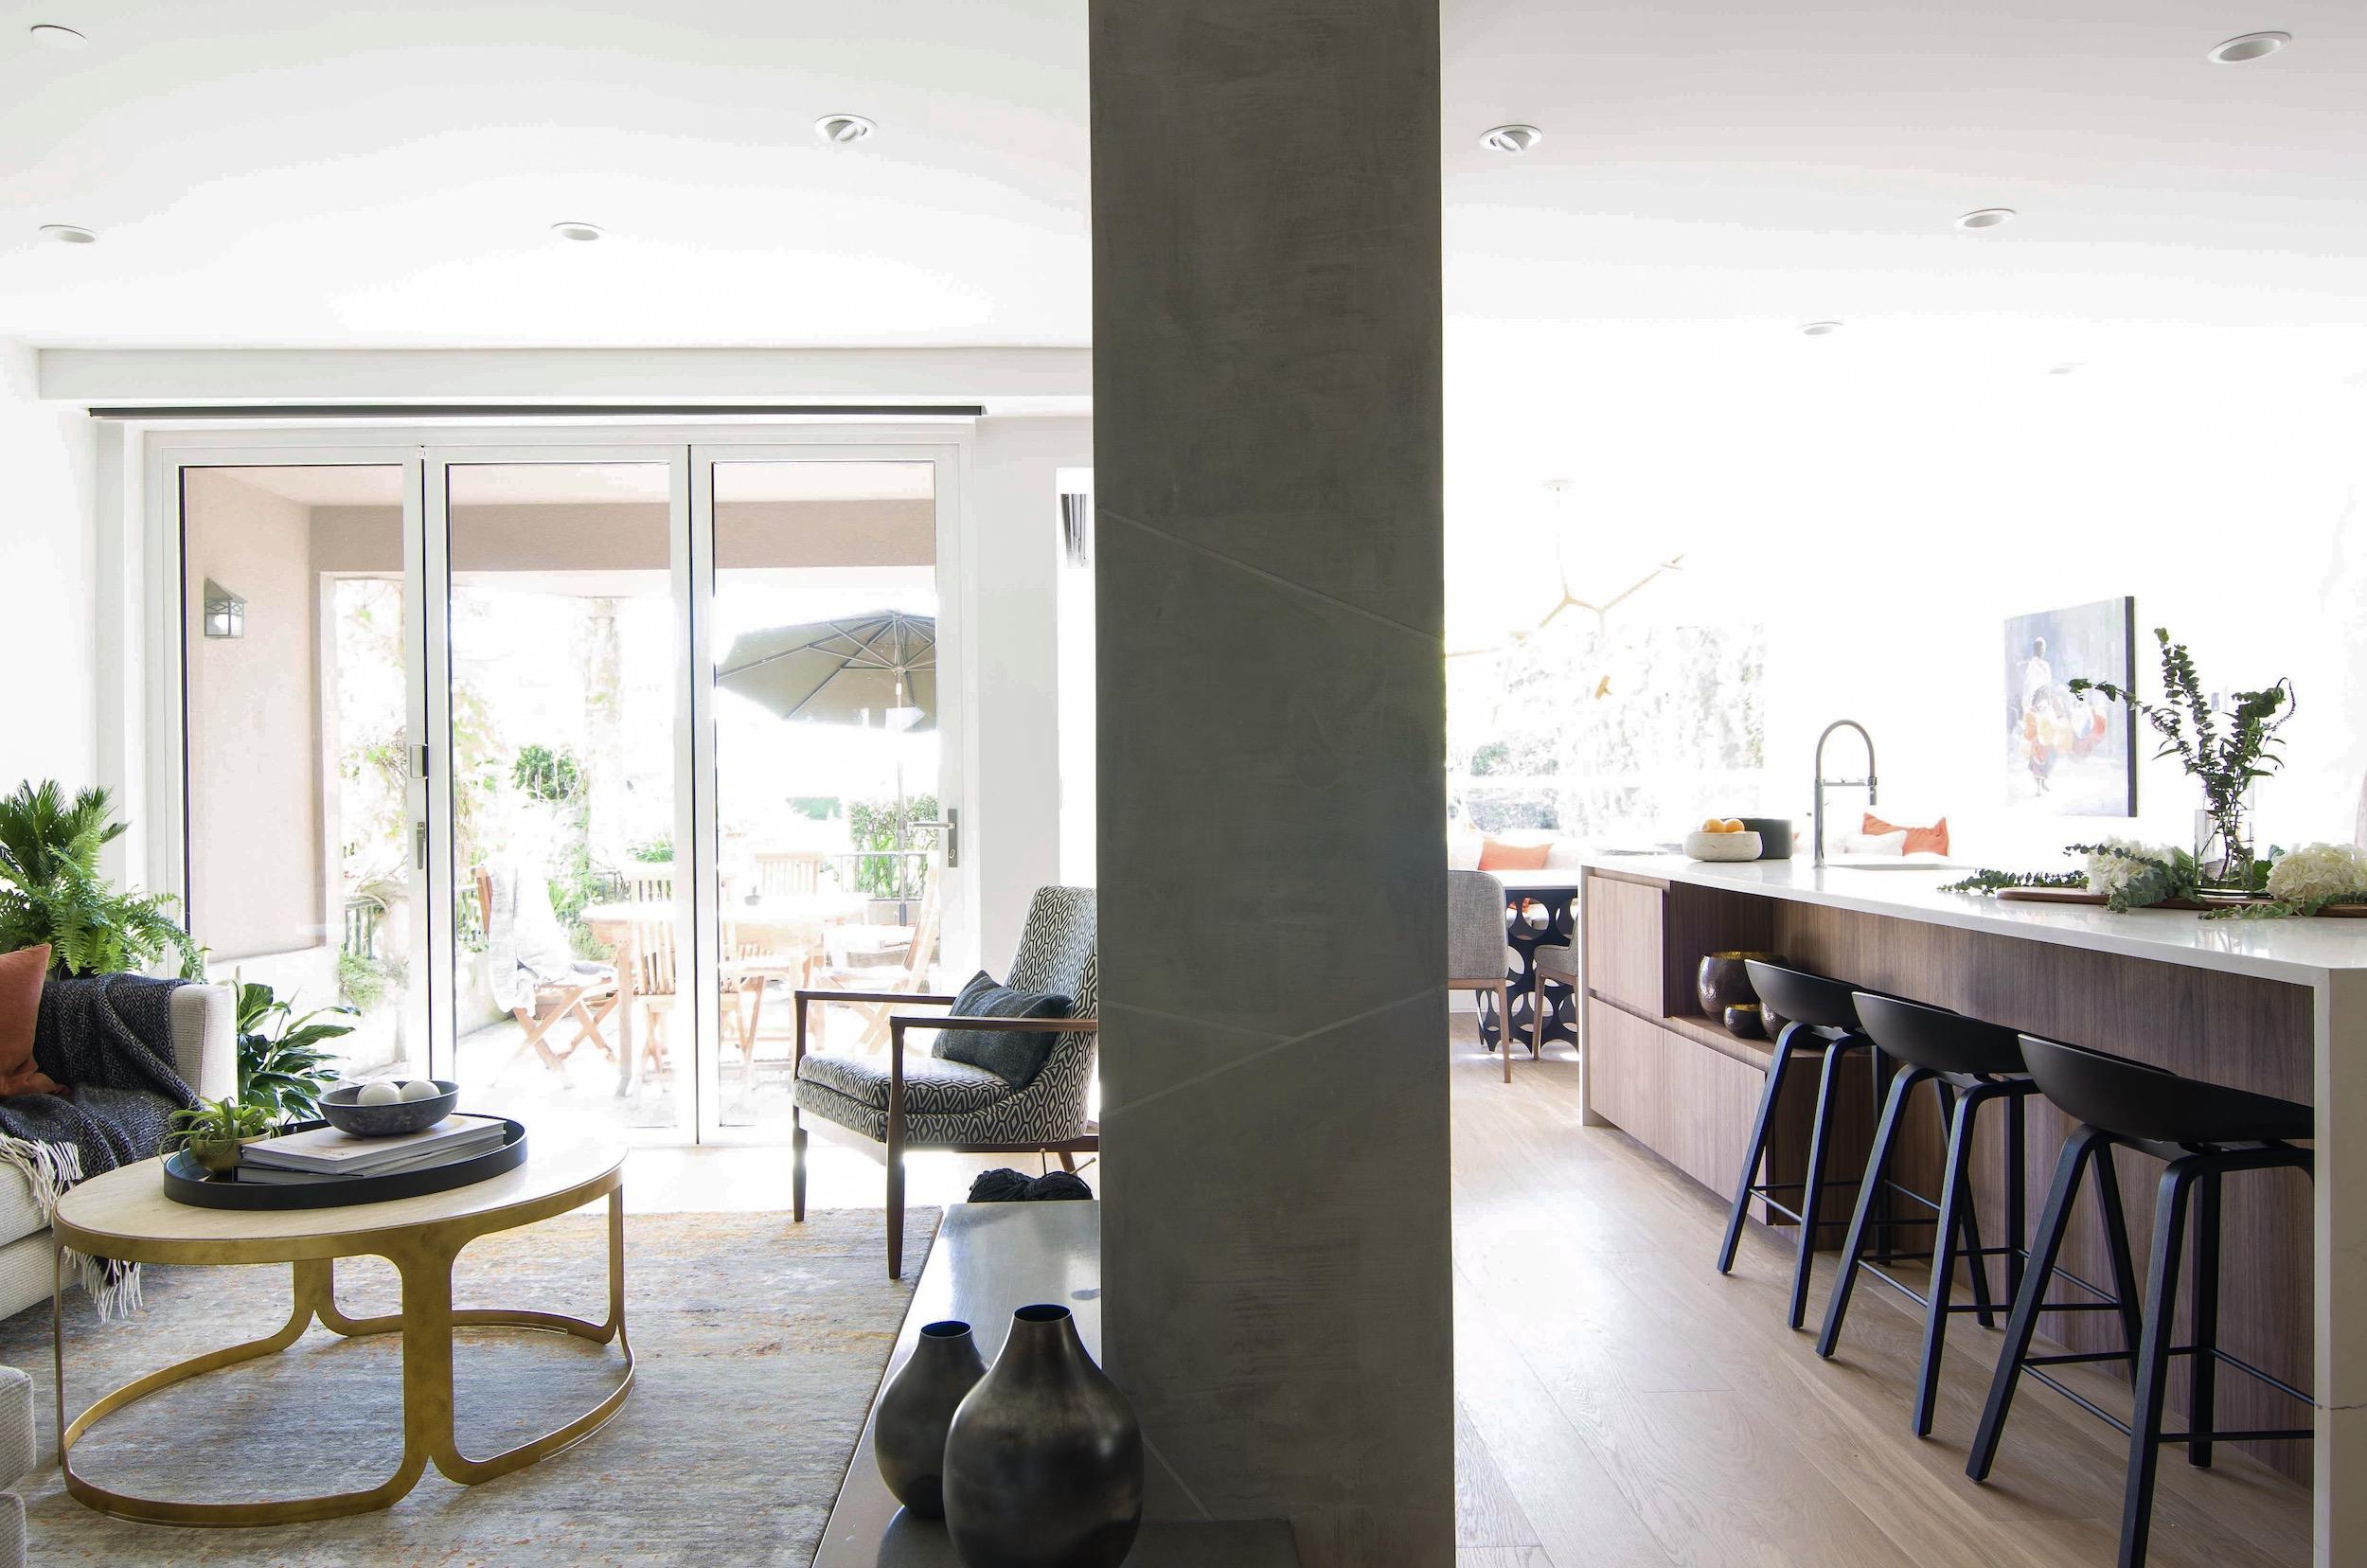 KRC_Spyglass_Living_Dining_Rooms.JPG